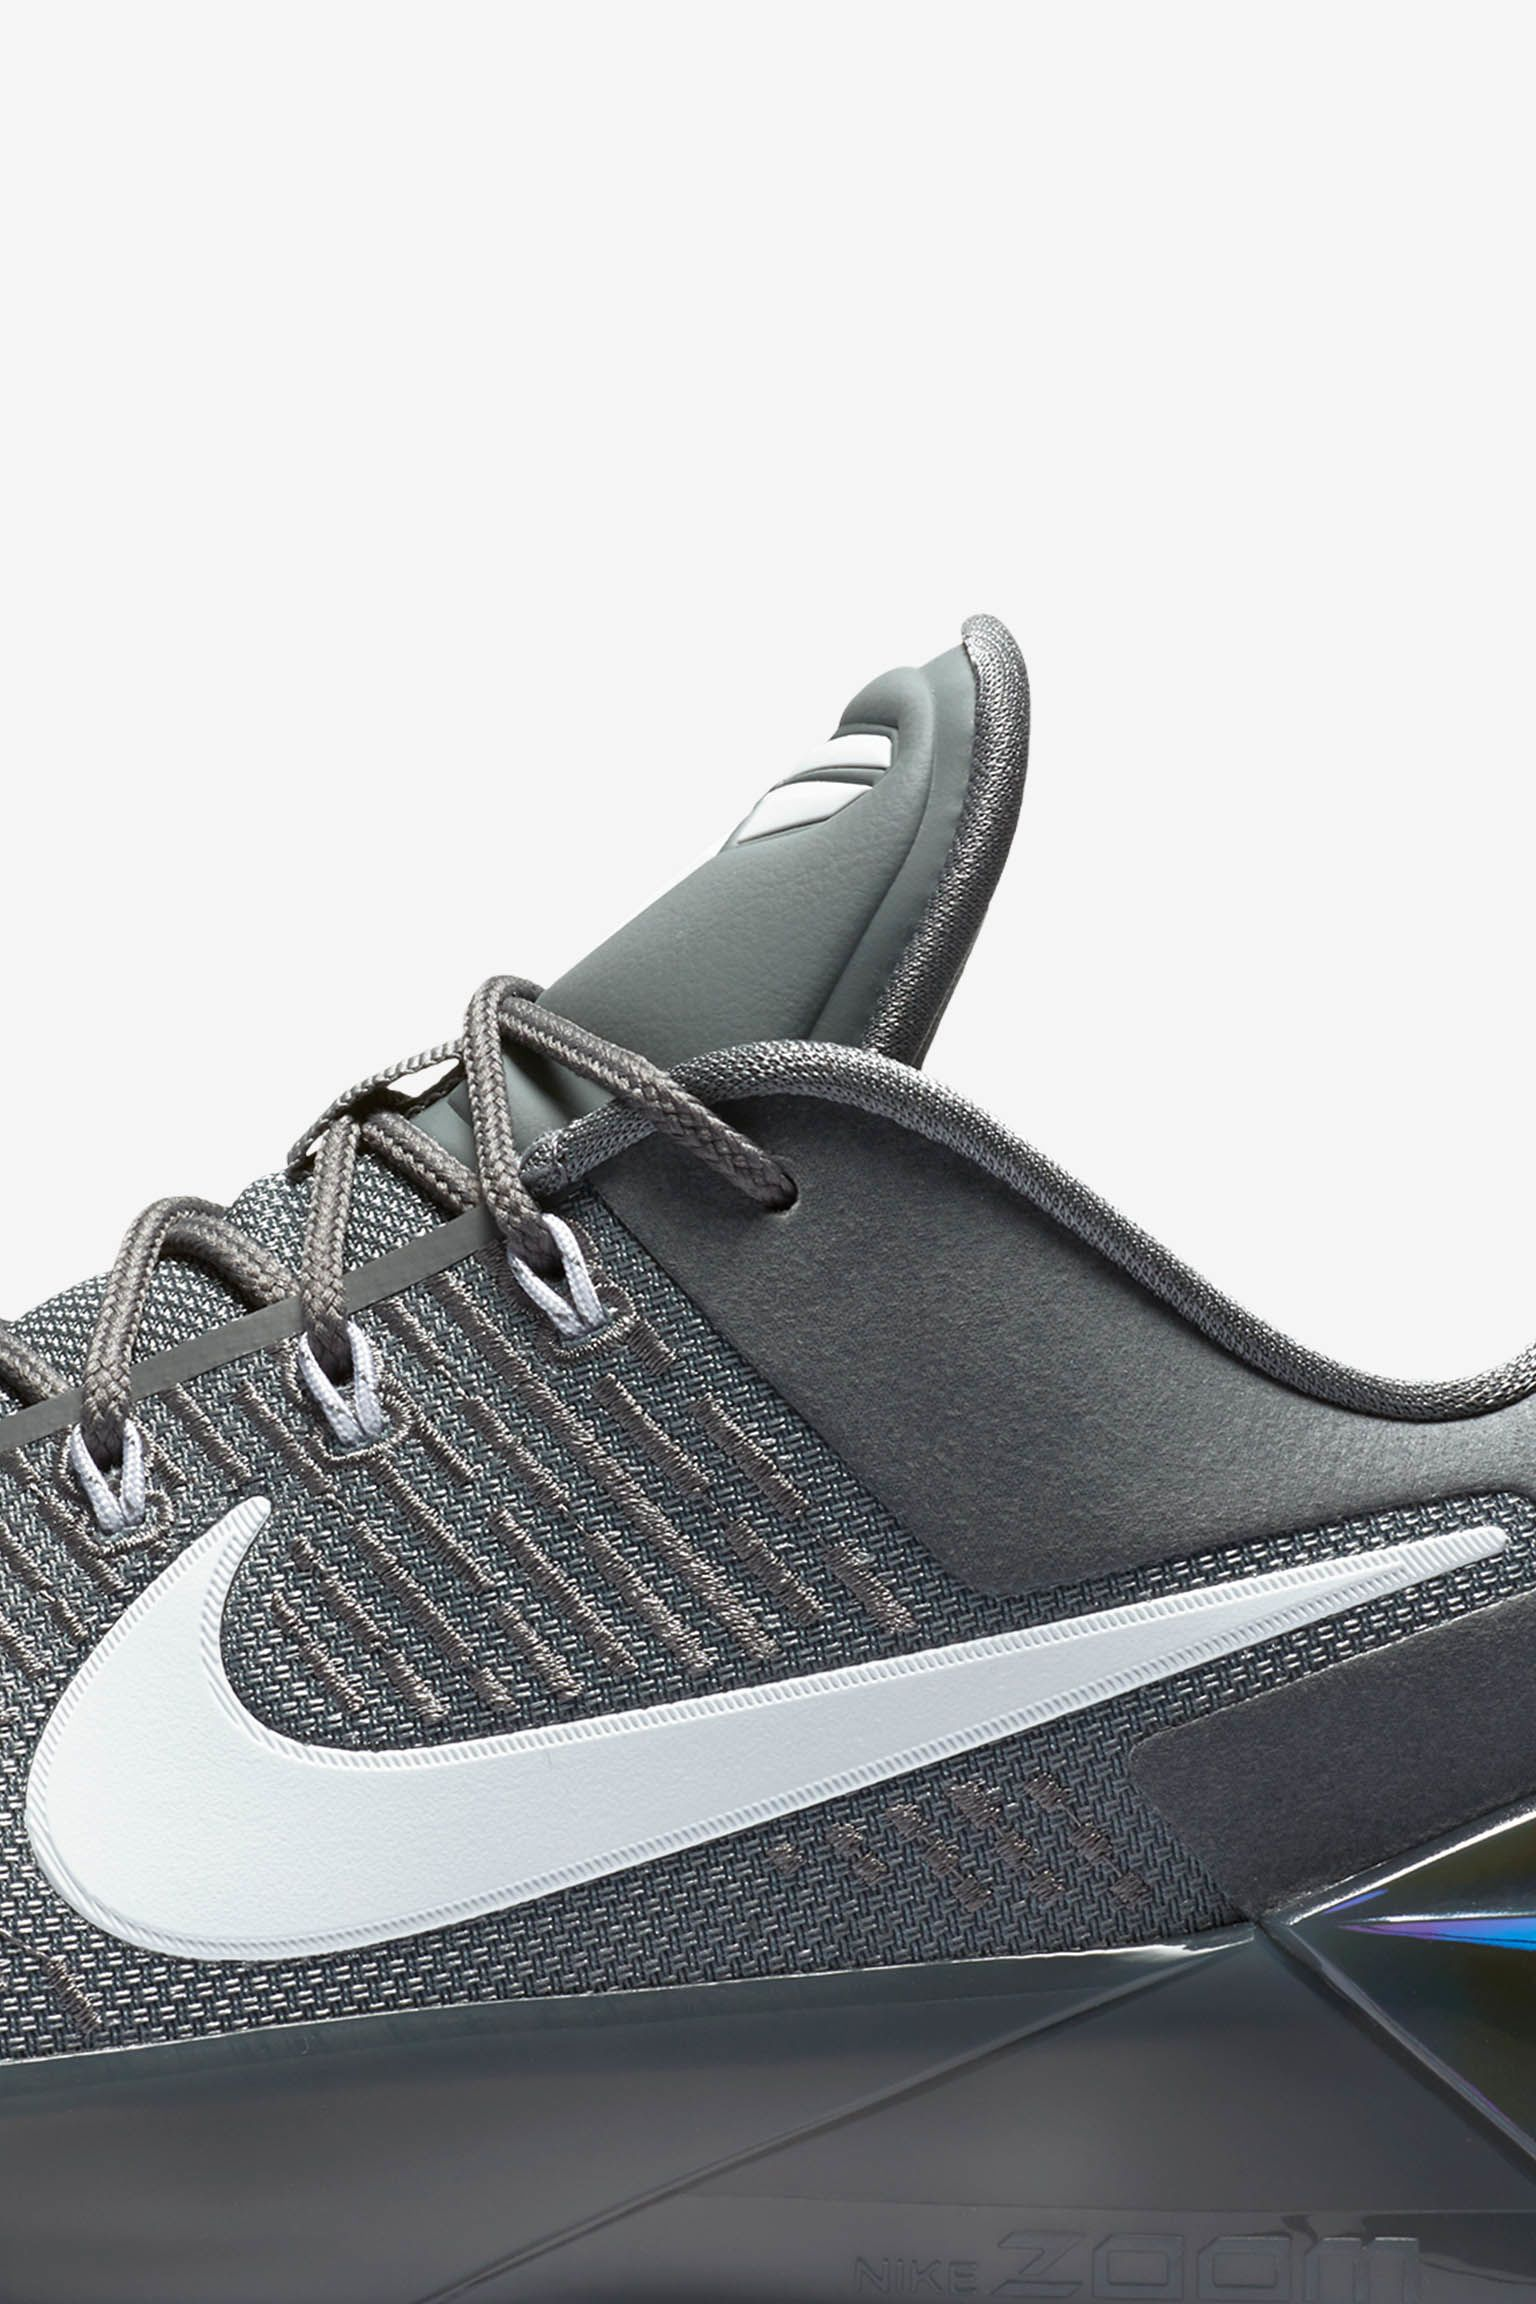 Nike Kobe A.D. 'Cool Grey'. Release Date